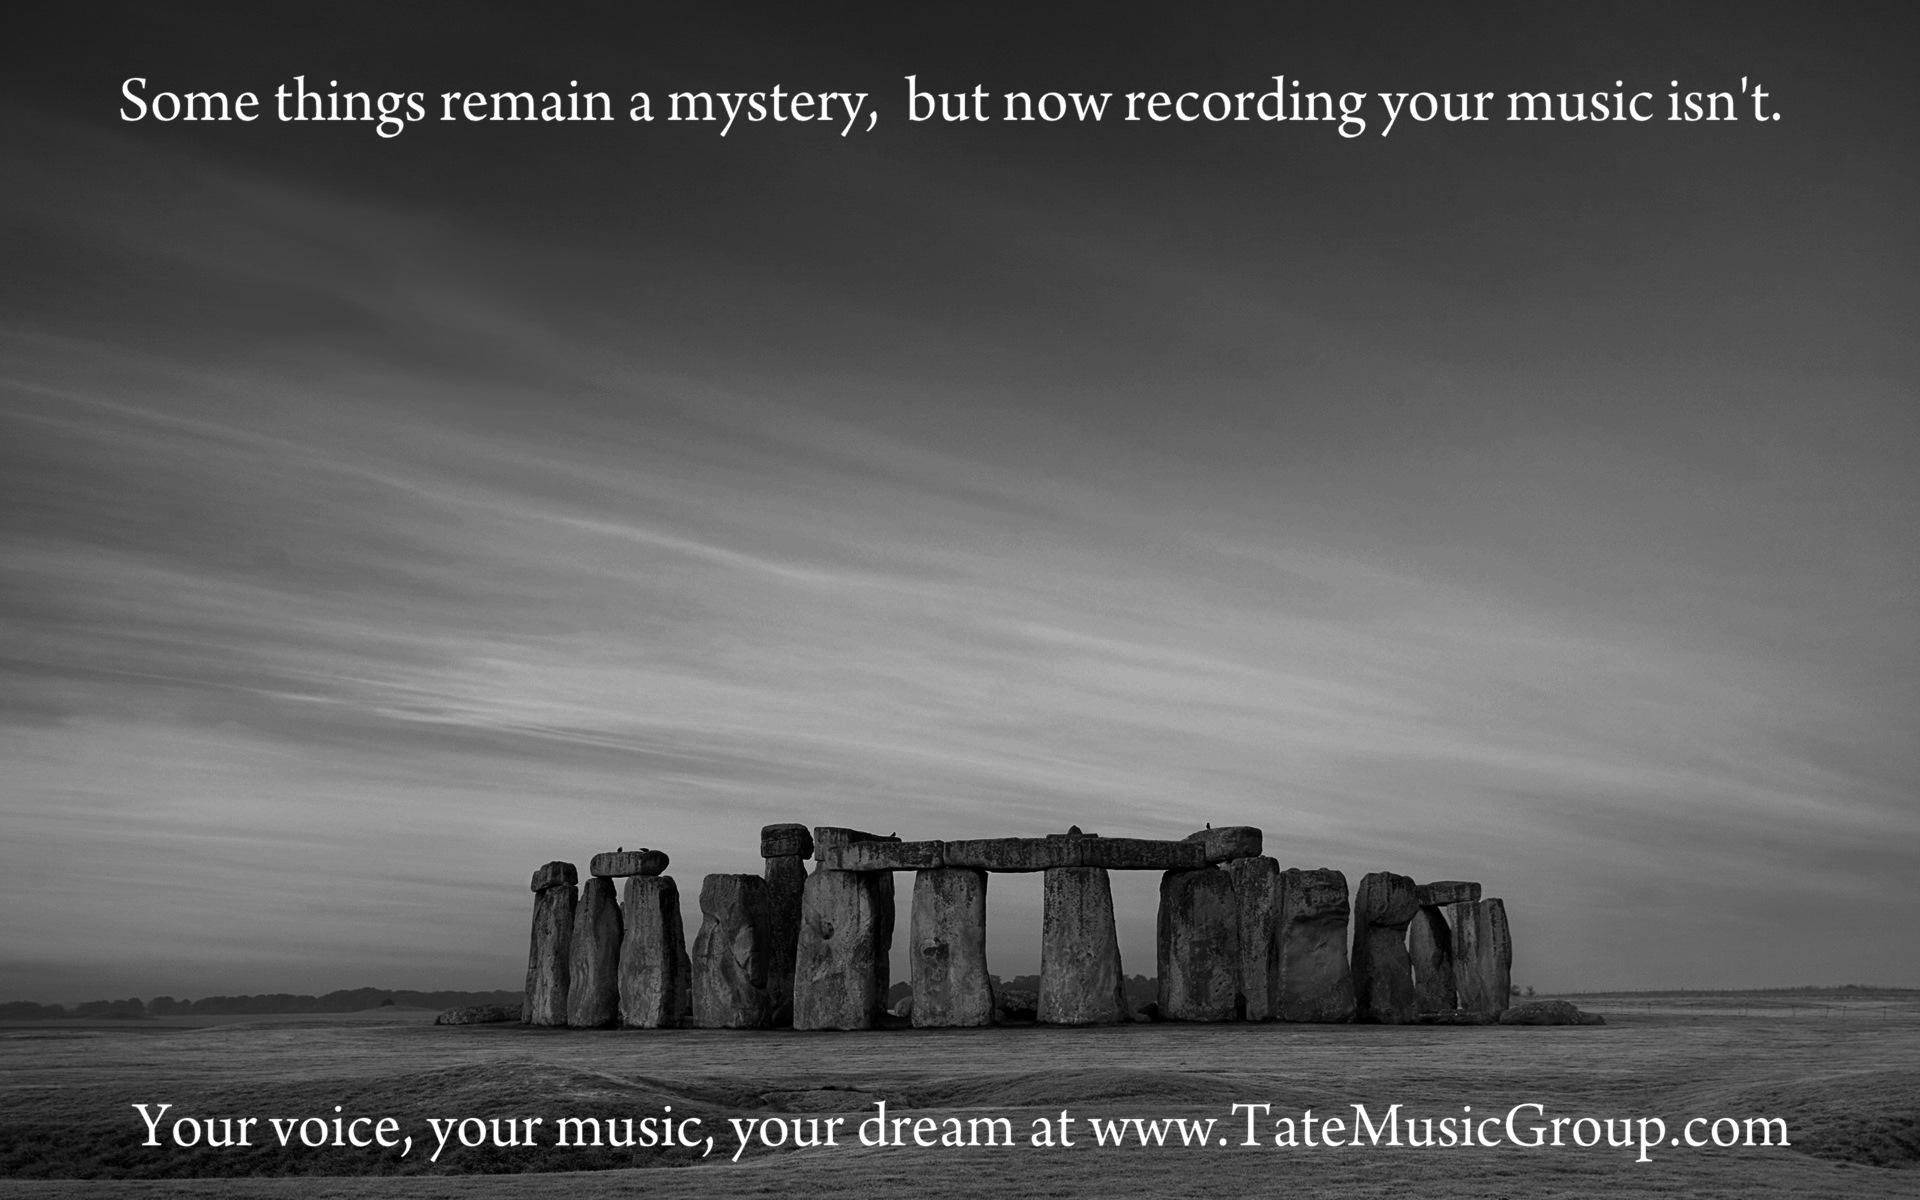 tate music